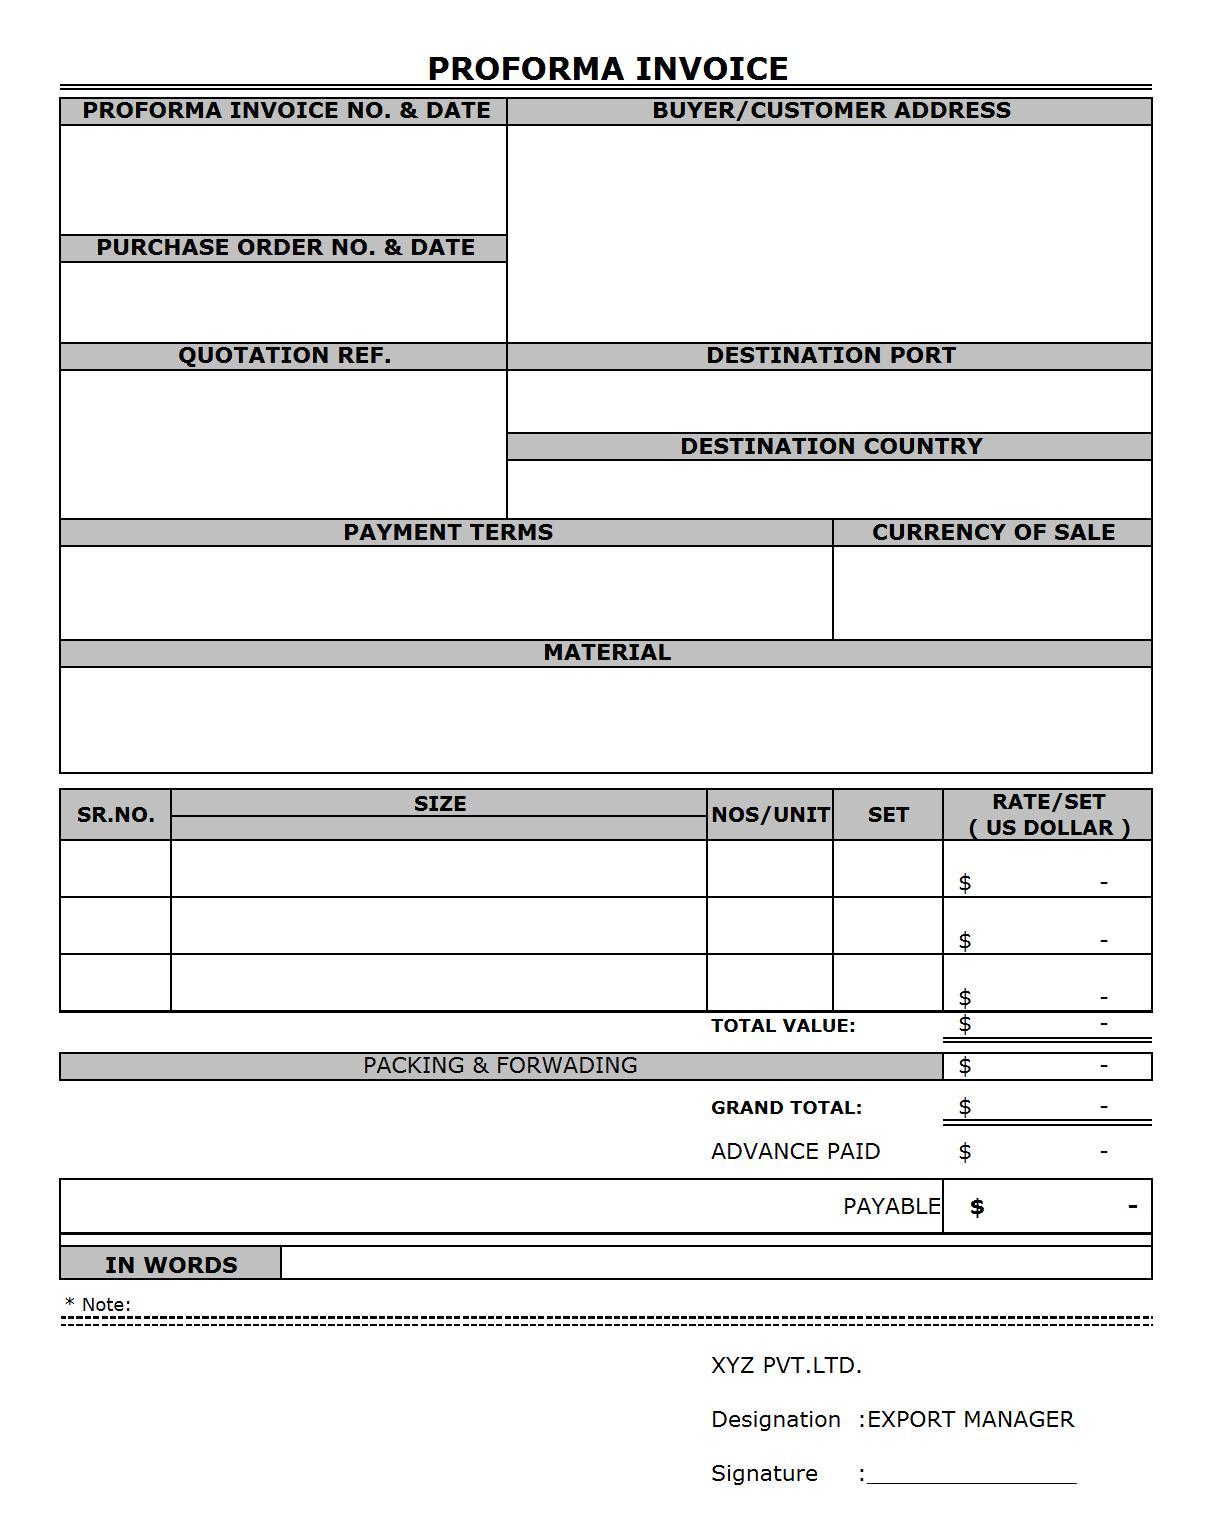 Blank Proforma Invoice Template Free